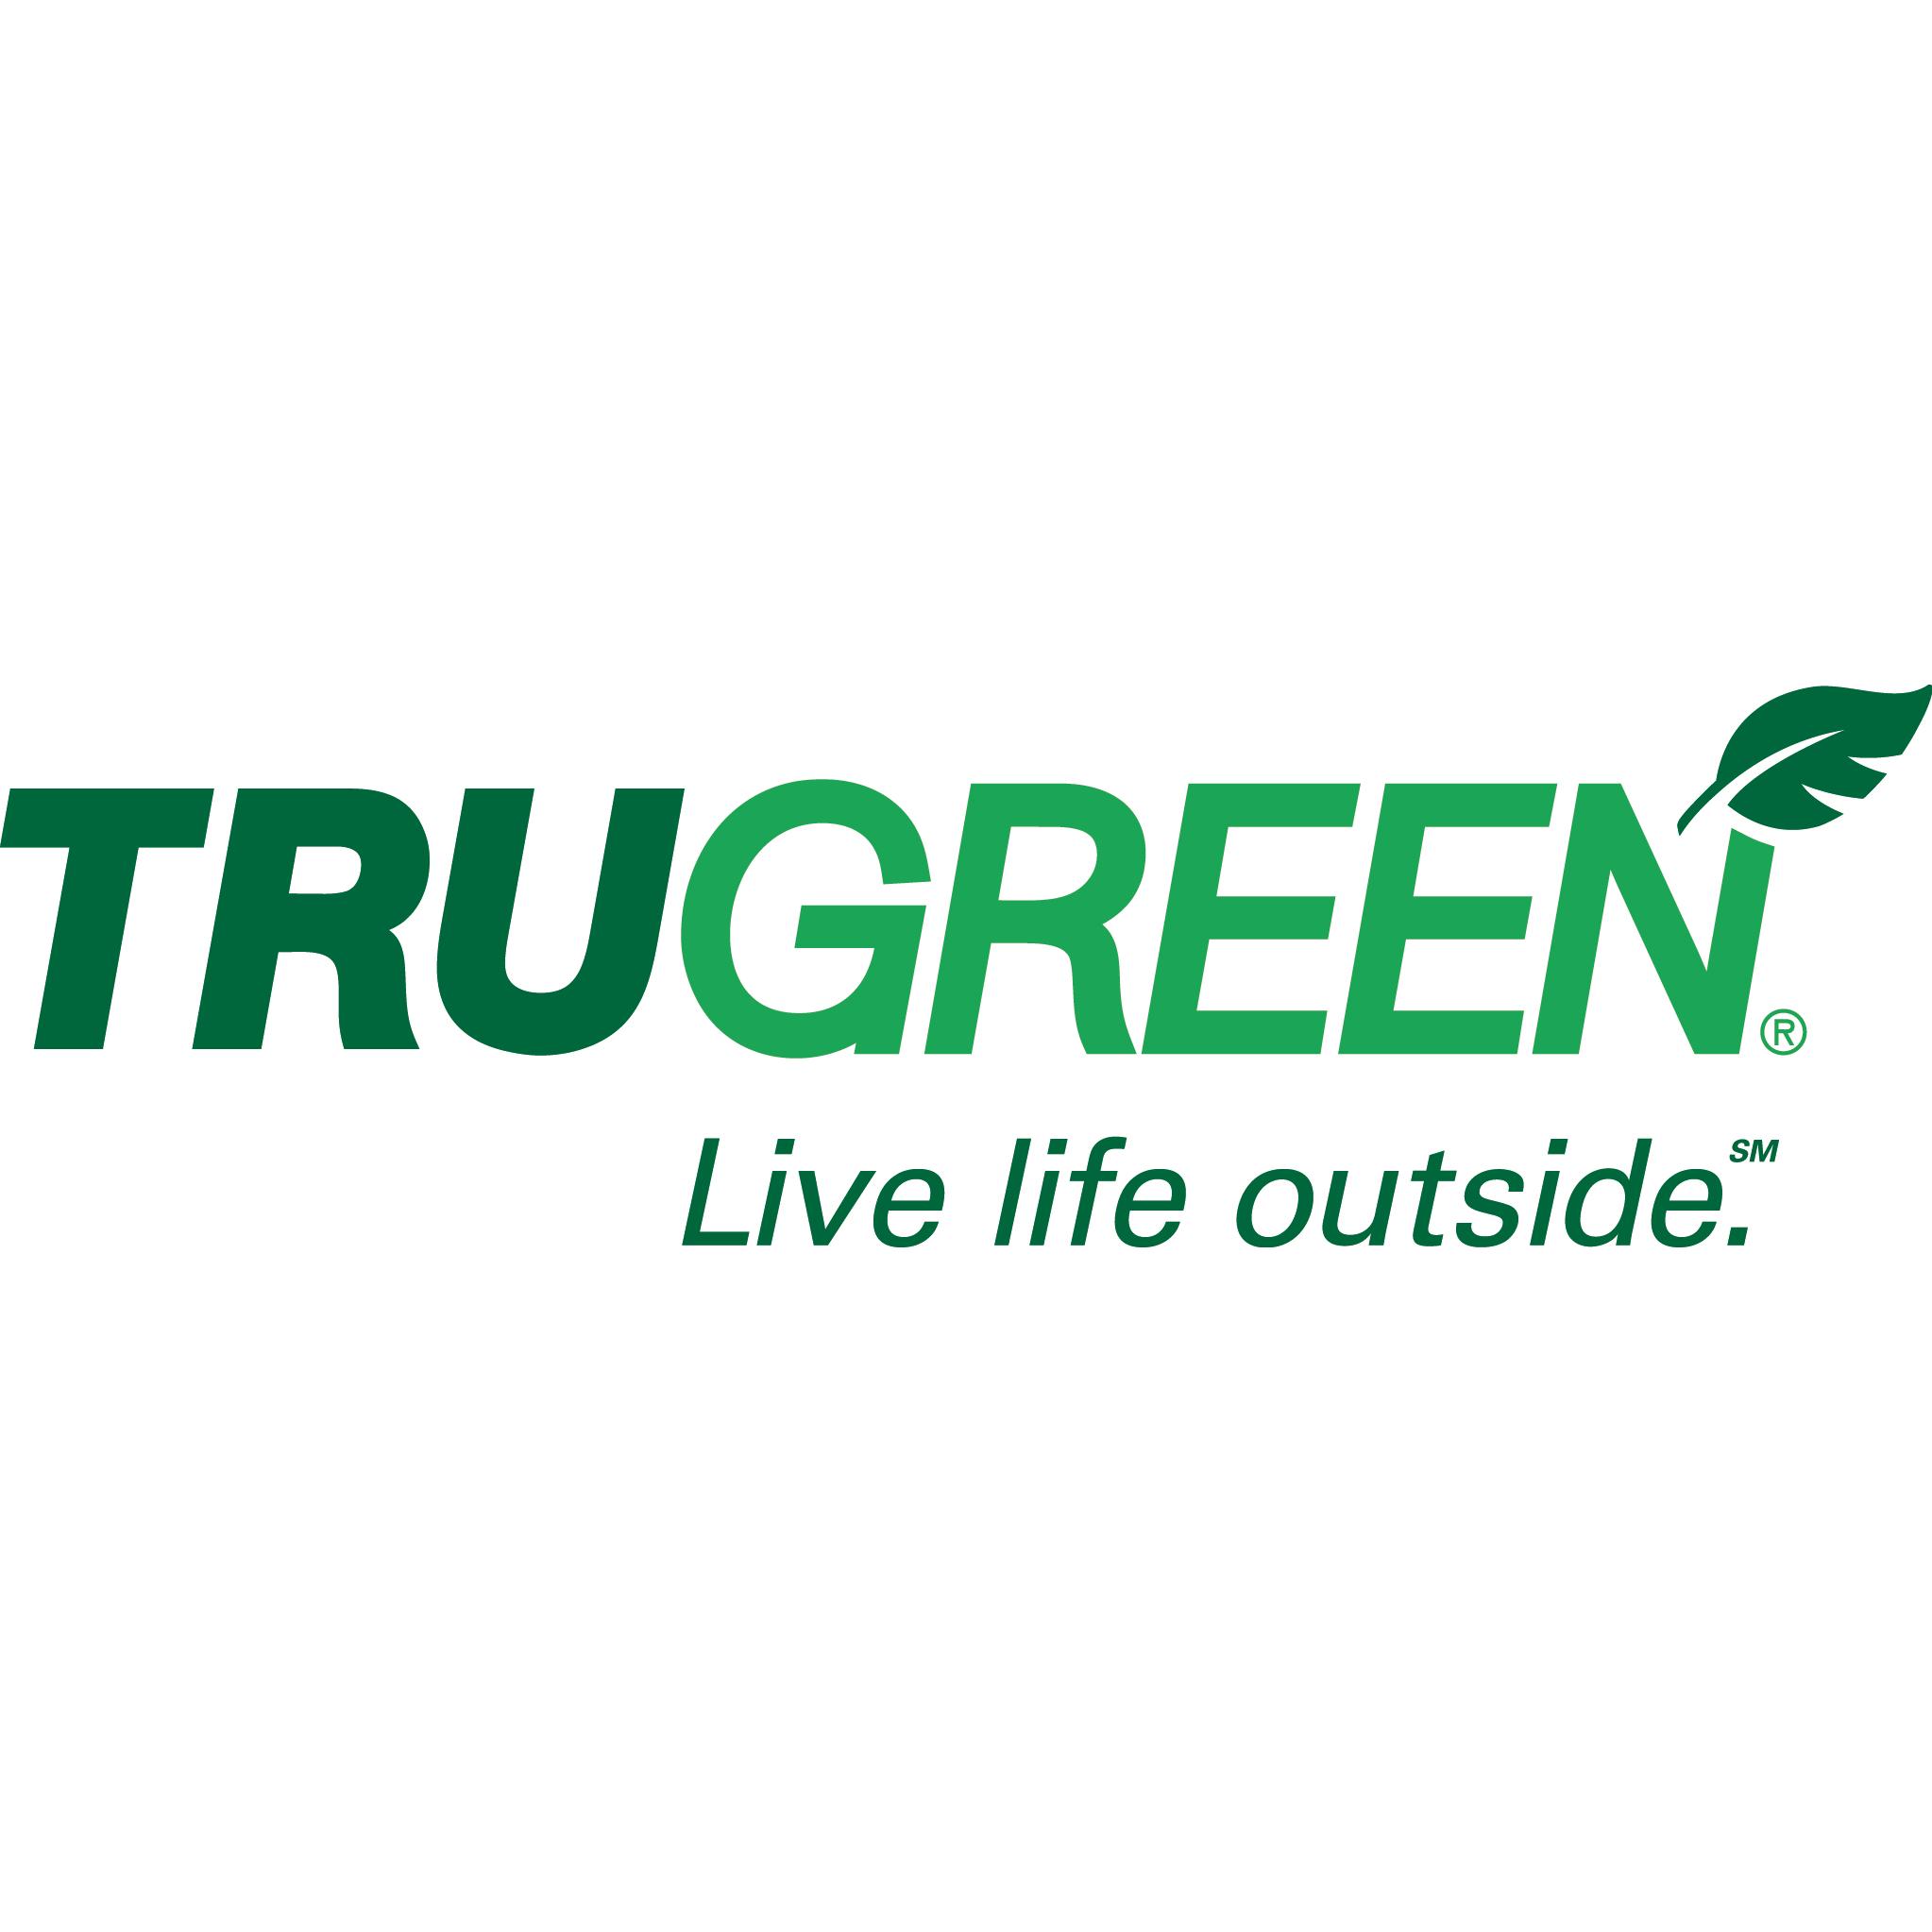 TruGreen - ad image